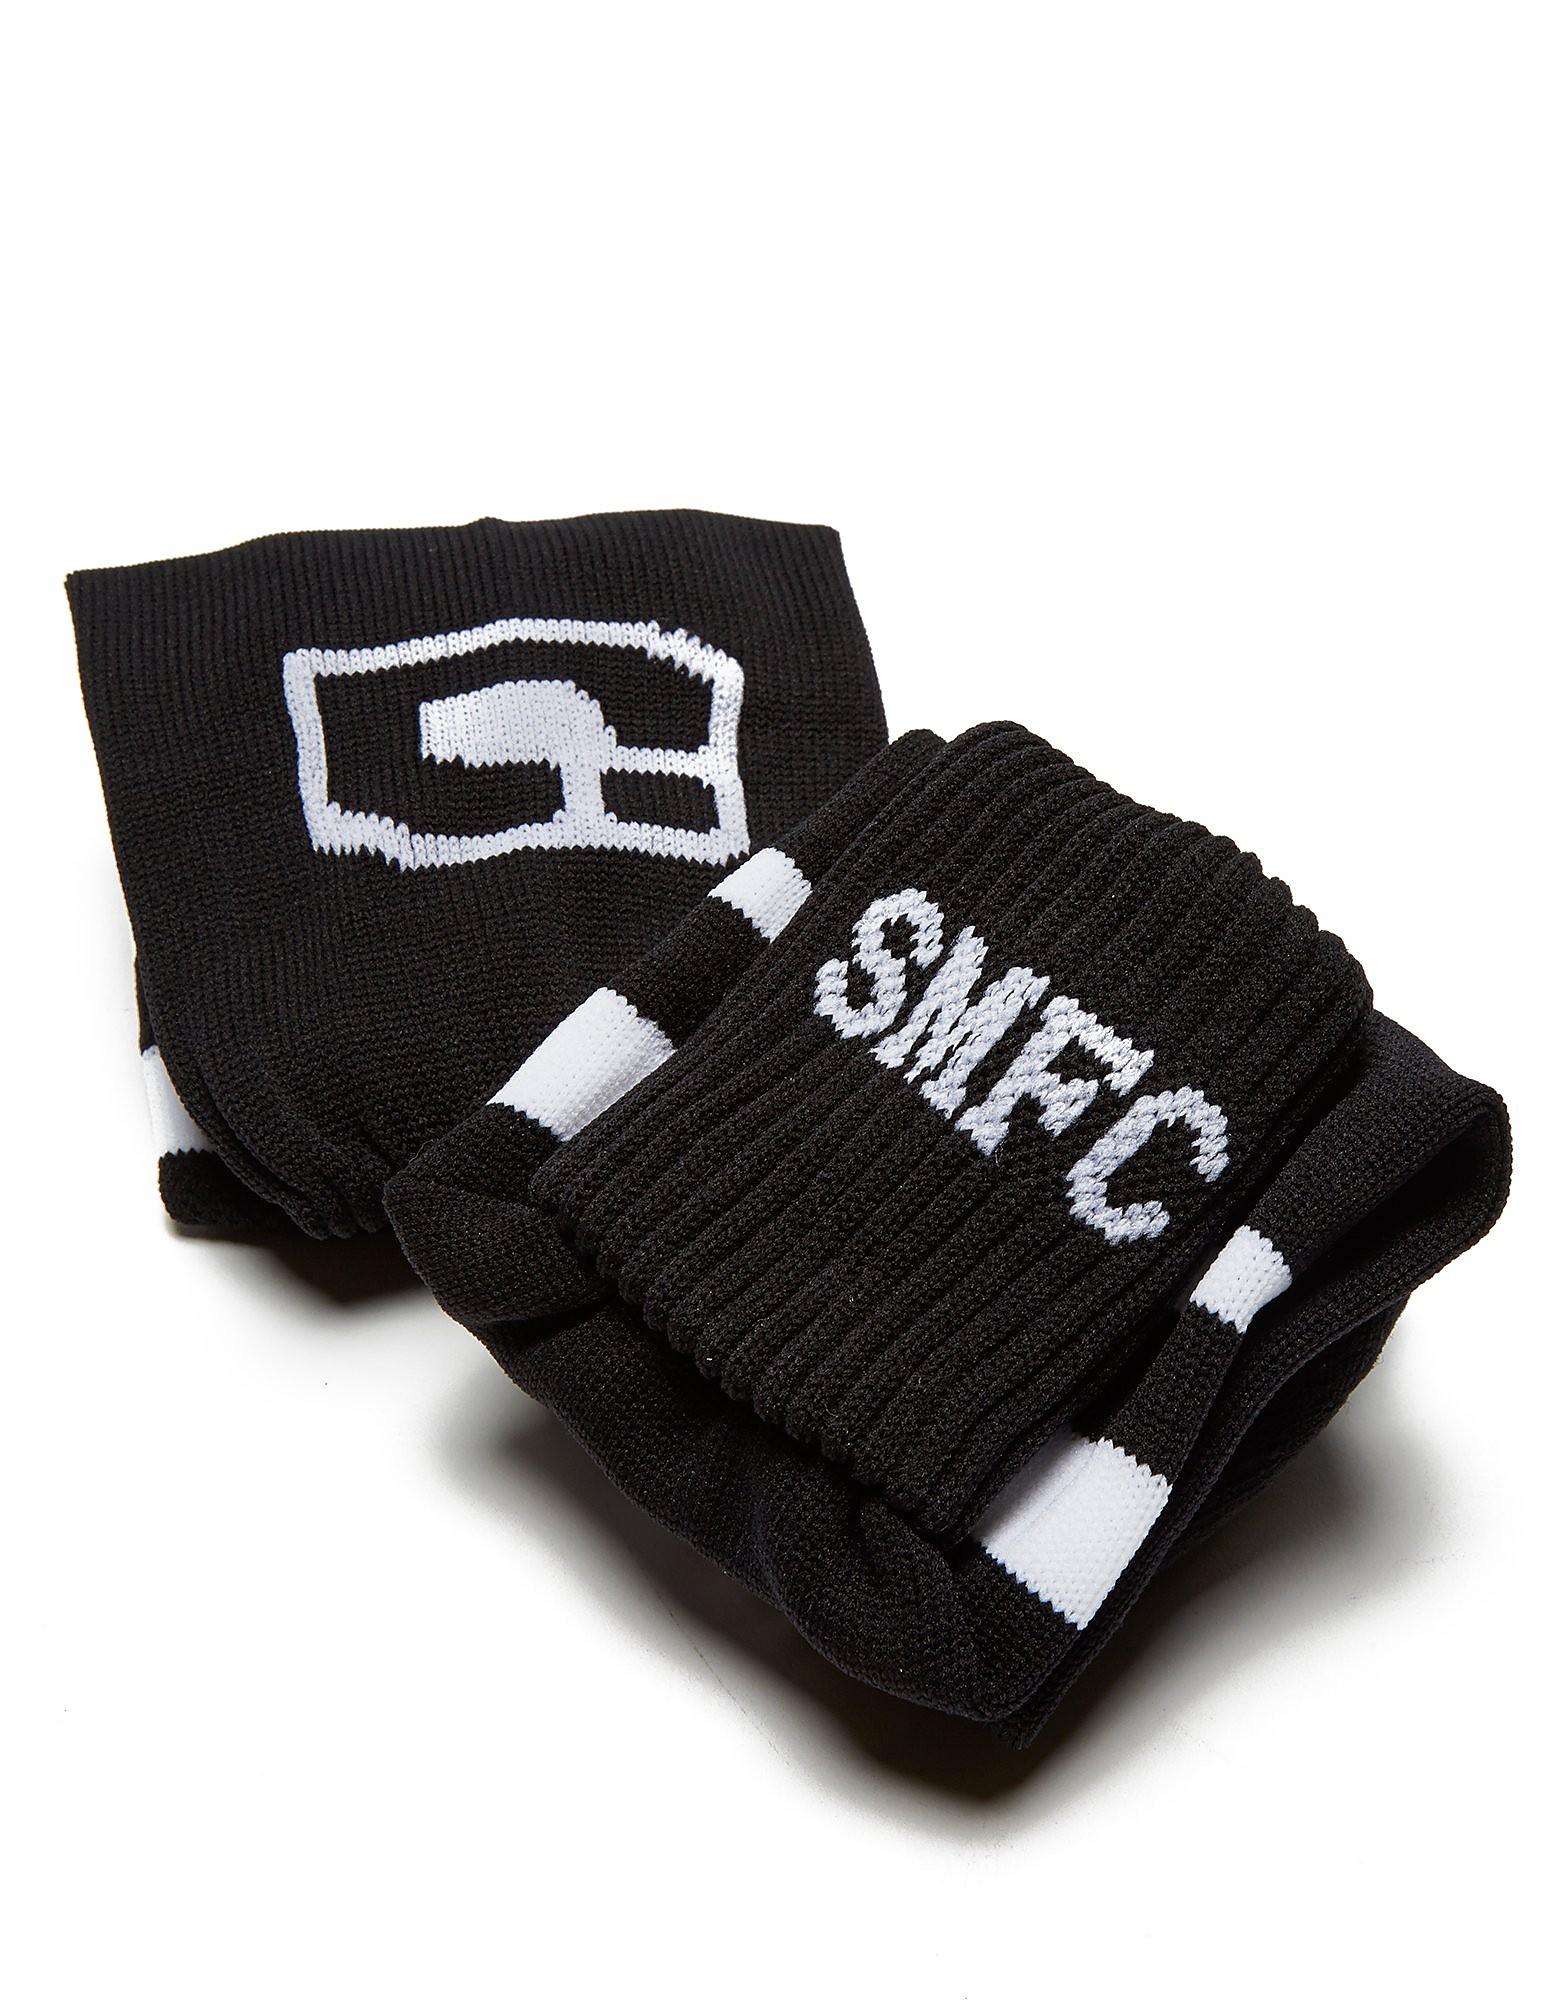 Carbrini St Mirren FC 2015 Home Socks